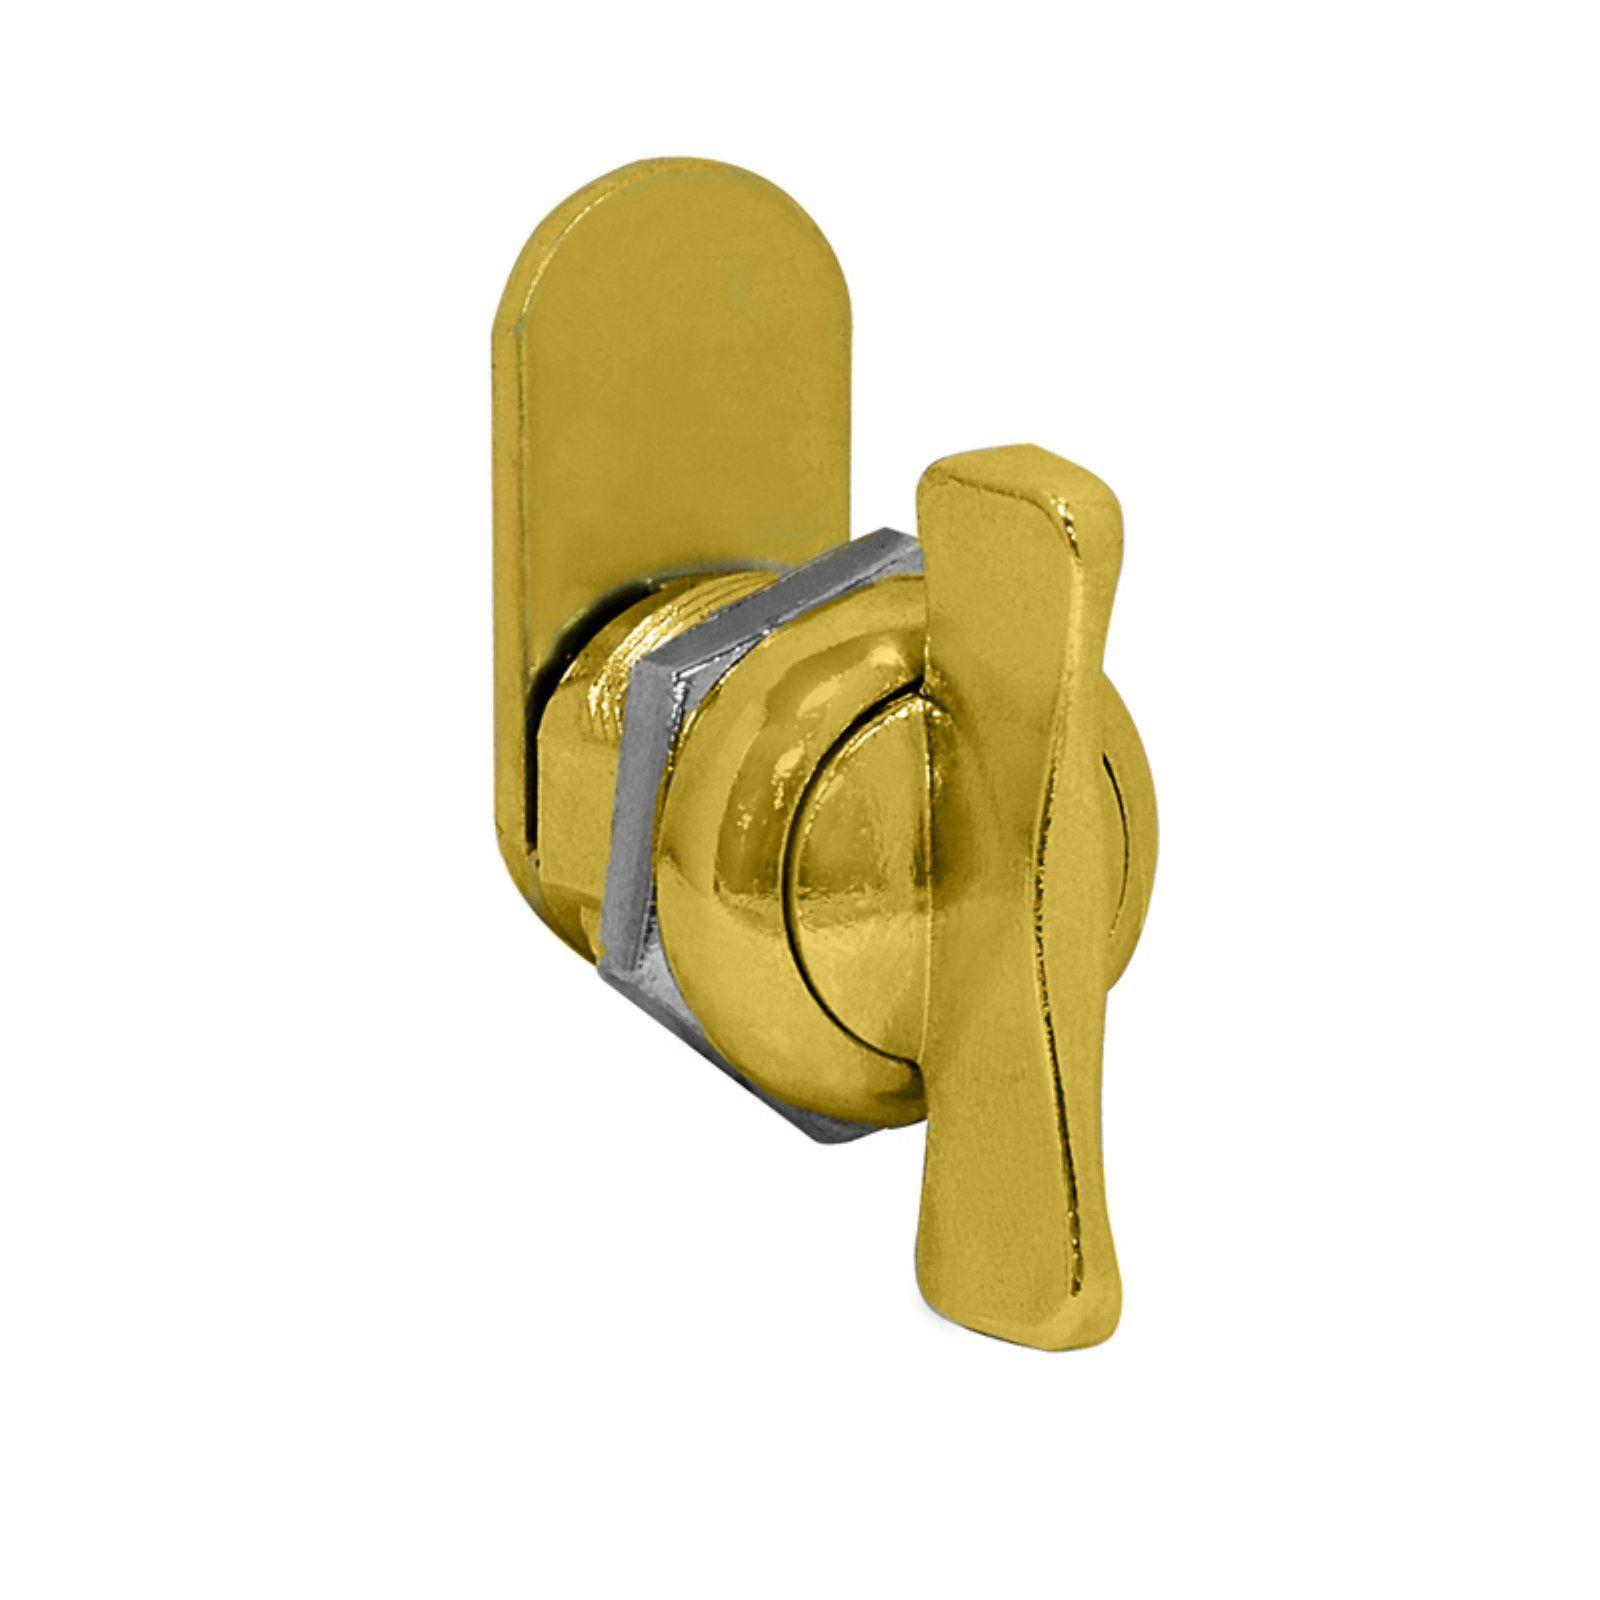 Salsbury Gold Finish Thumb Latch For Locking Column Mailbox Modern Mailbox Modern Mailbox Latches Salsbury Industries